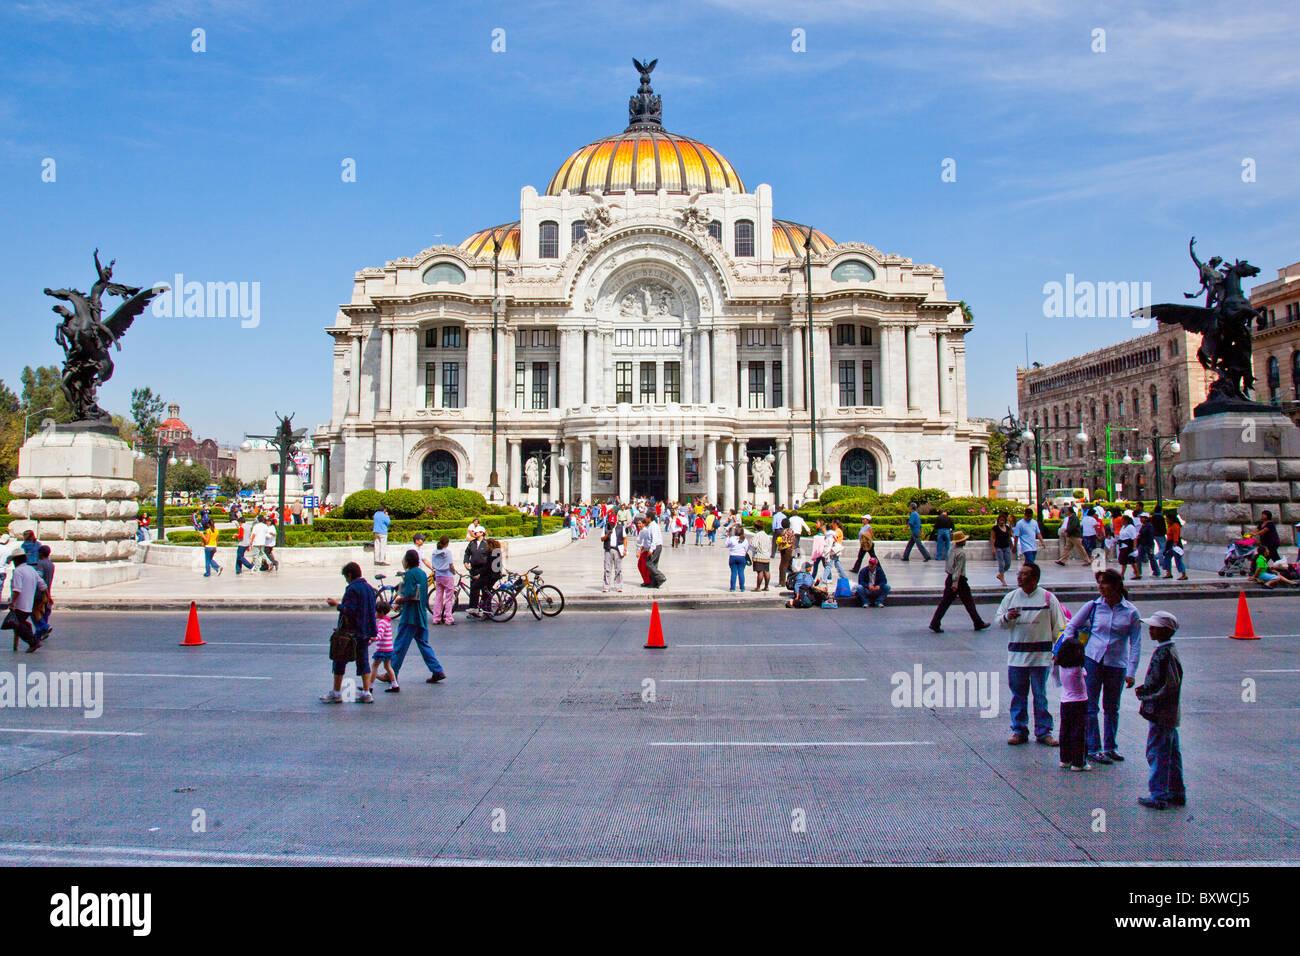 Palacio de Bellas Artes or the Palace of Fine Arts, Mexico City, Mexico Stock Photo